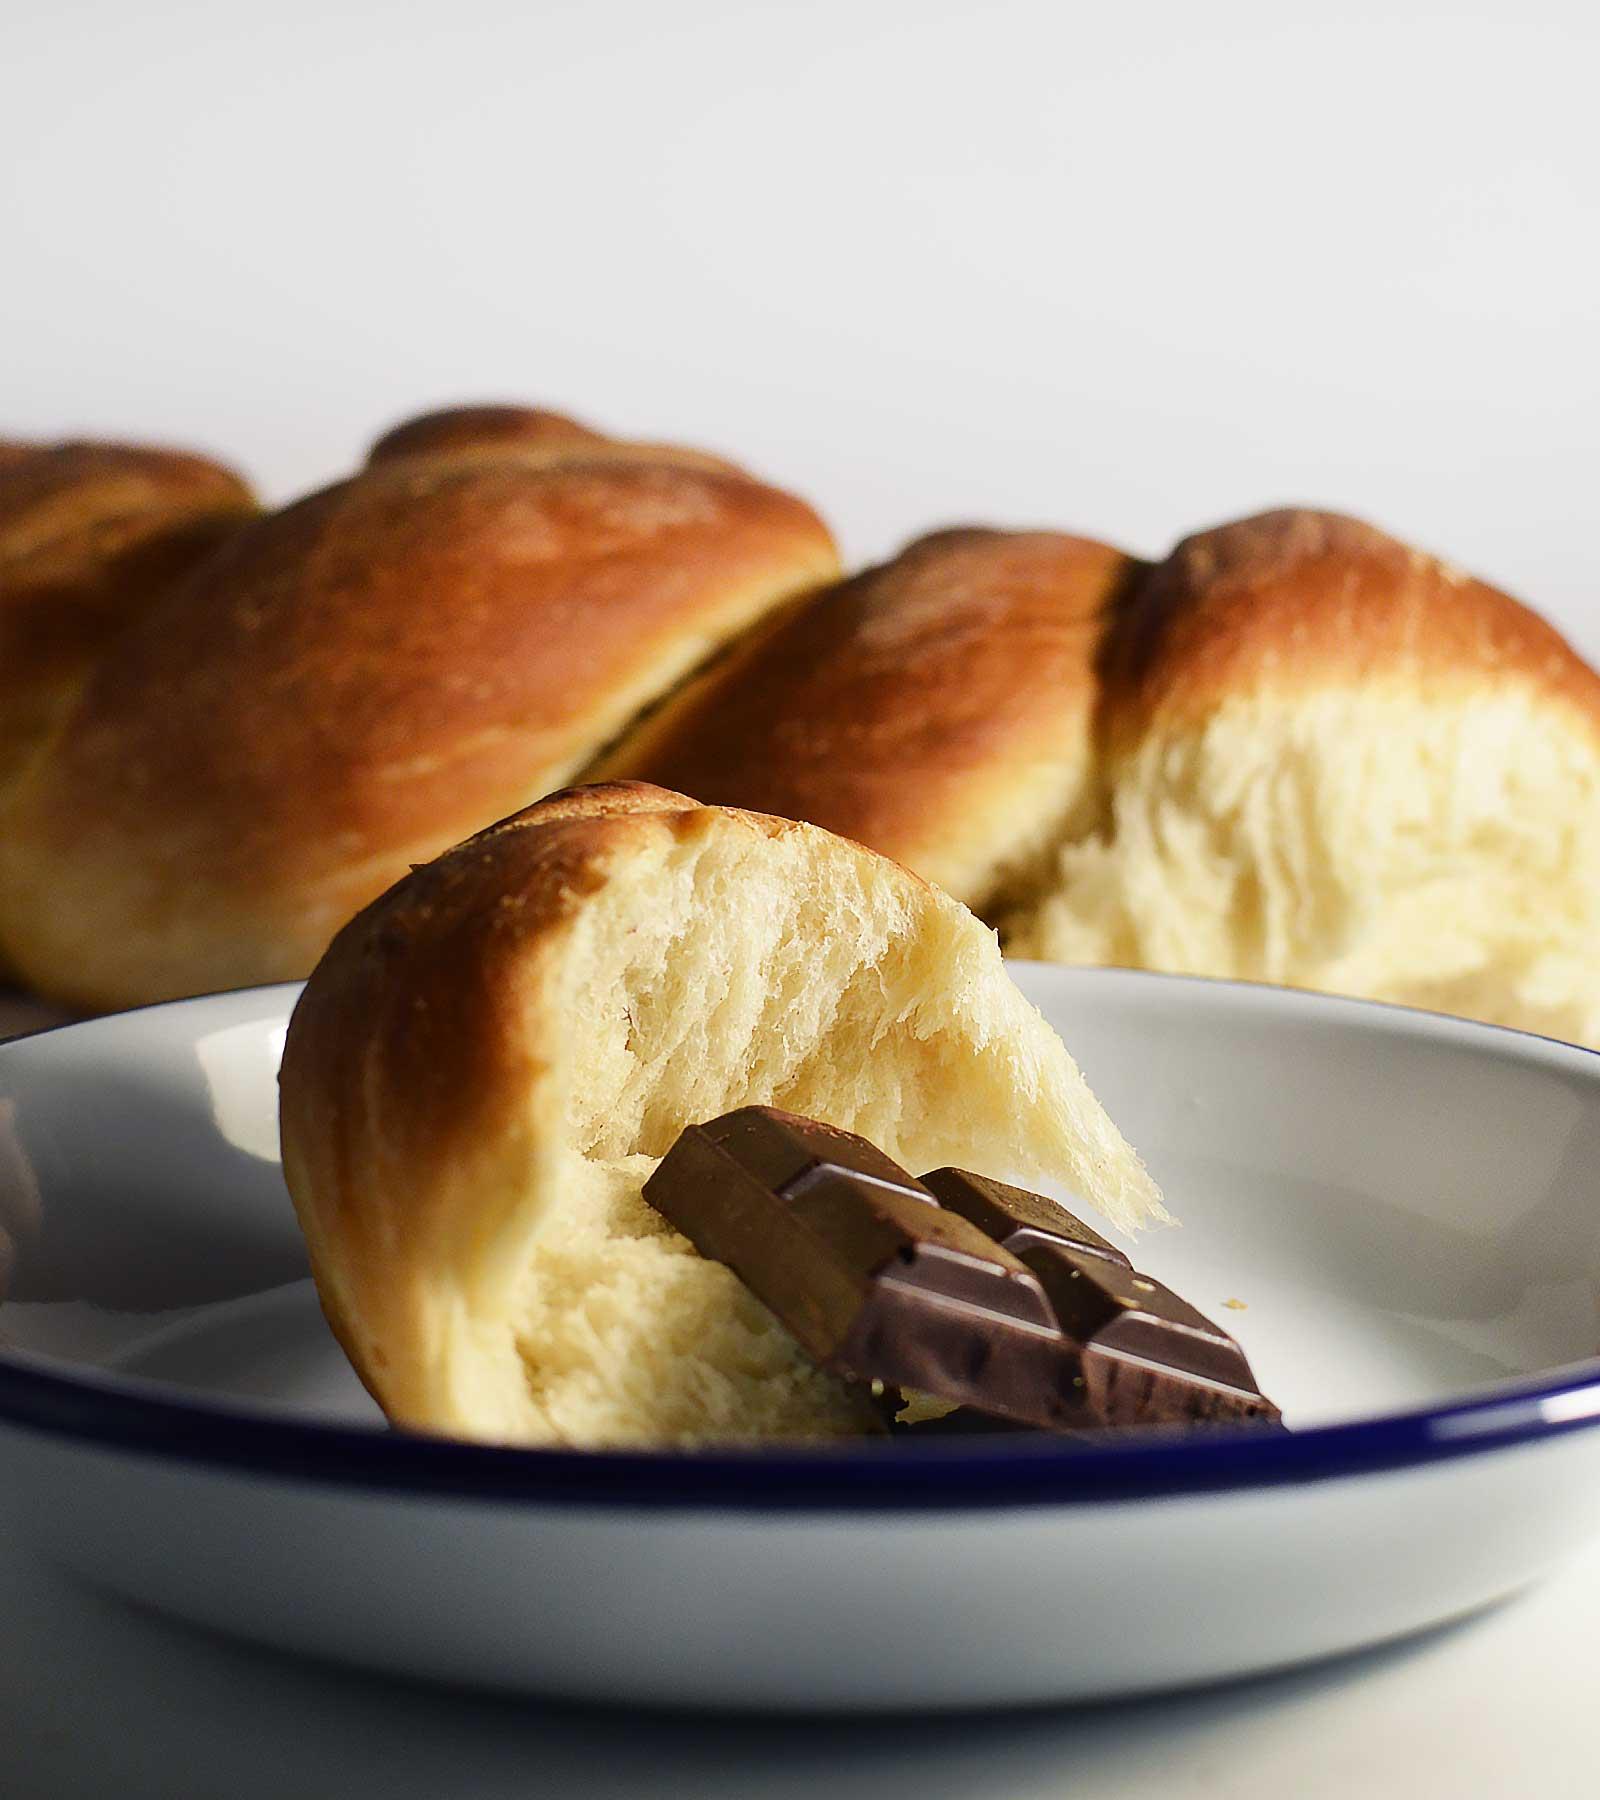 Trenza de pan de leche ideal para merendar